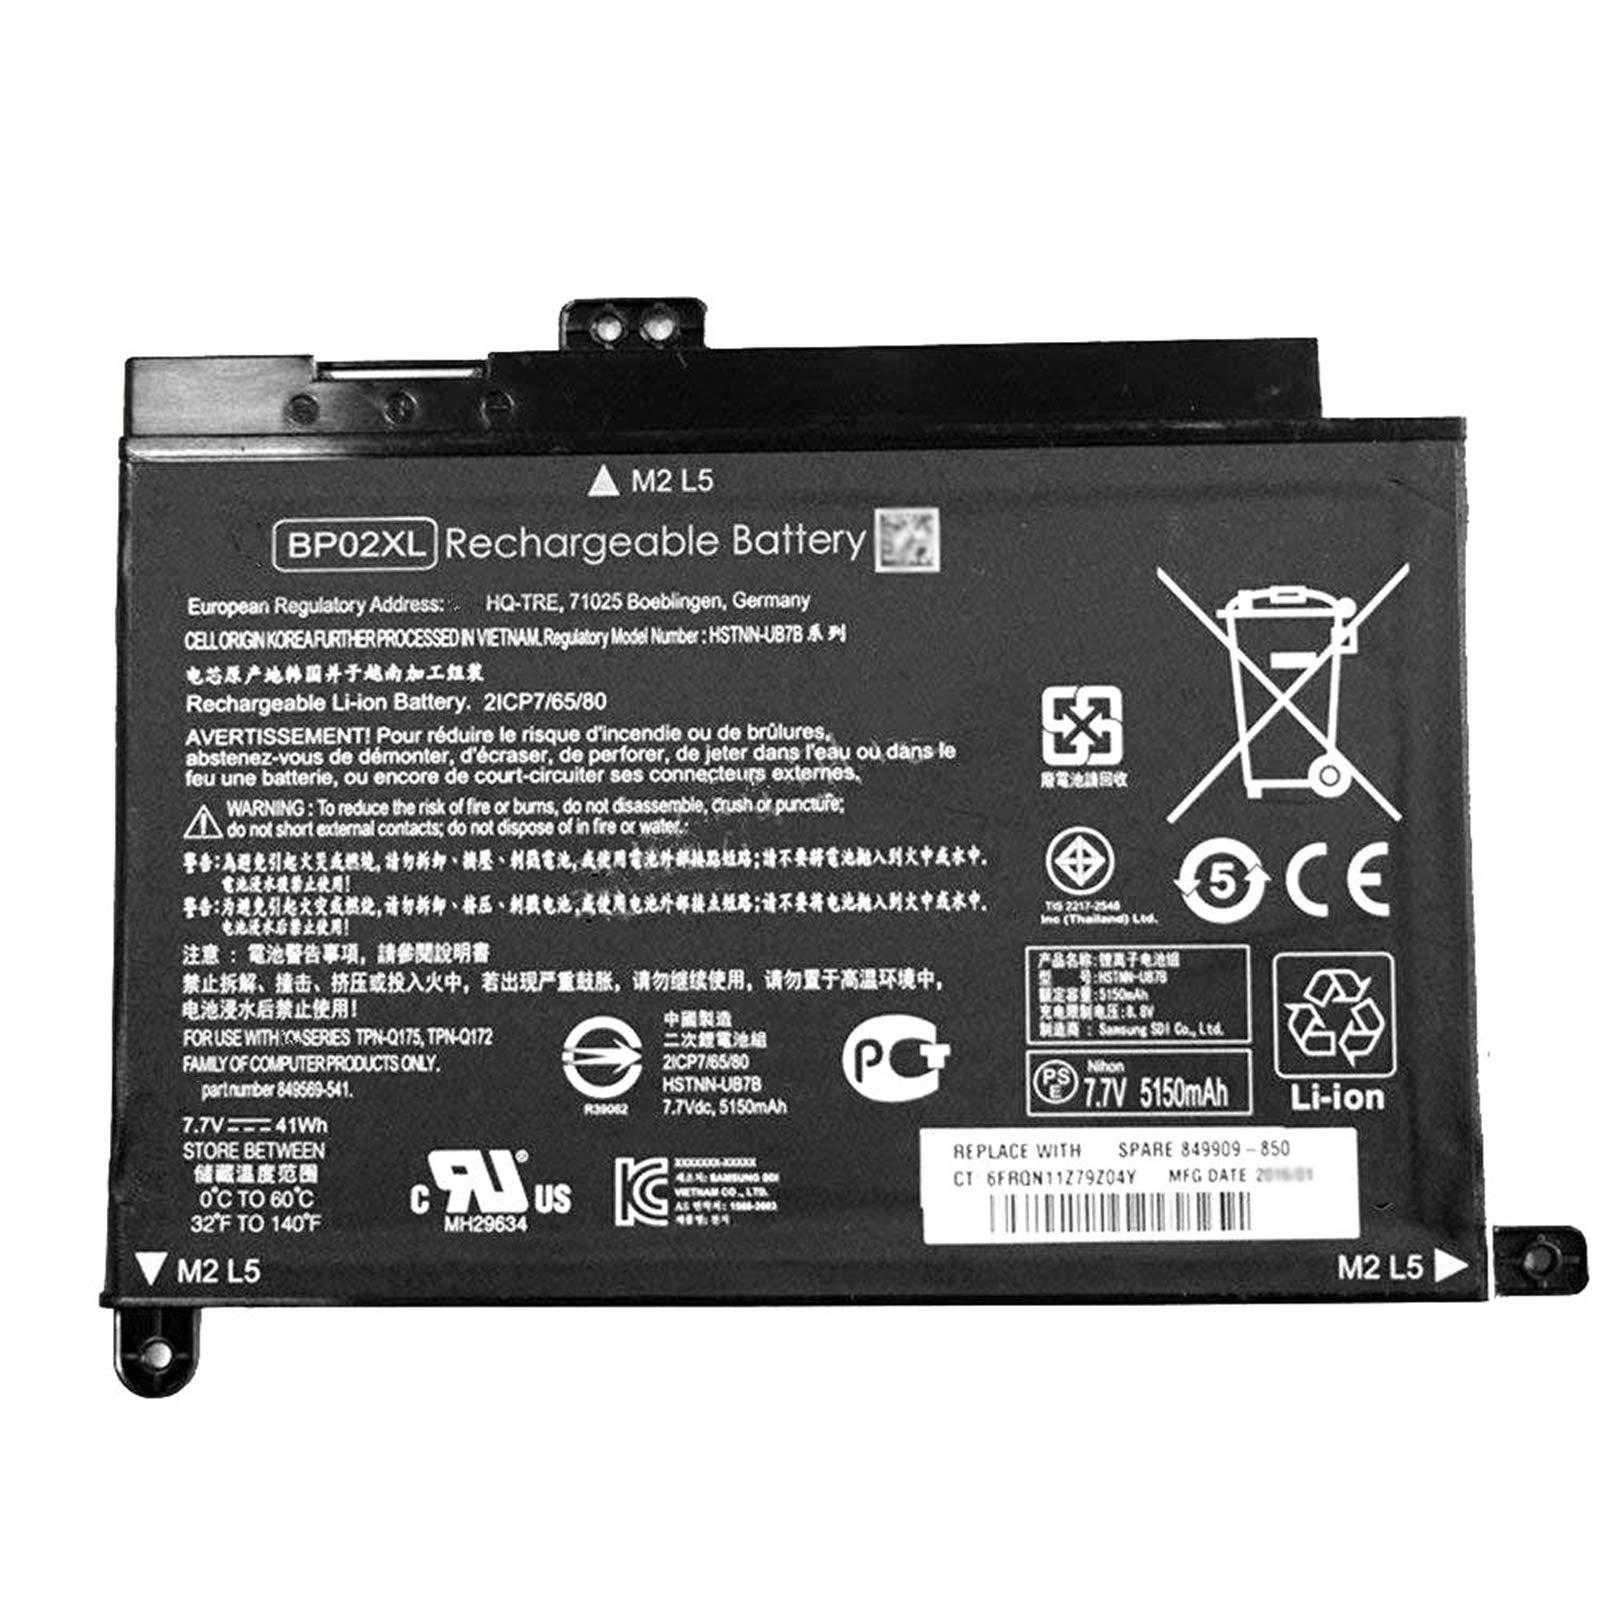 Bateria BP02XL 849909-850 7.7V 41W HP Pavilion PC 15 15-AU01